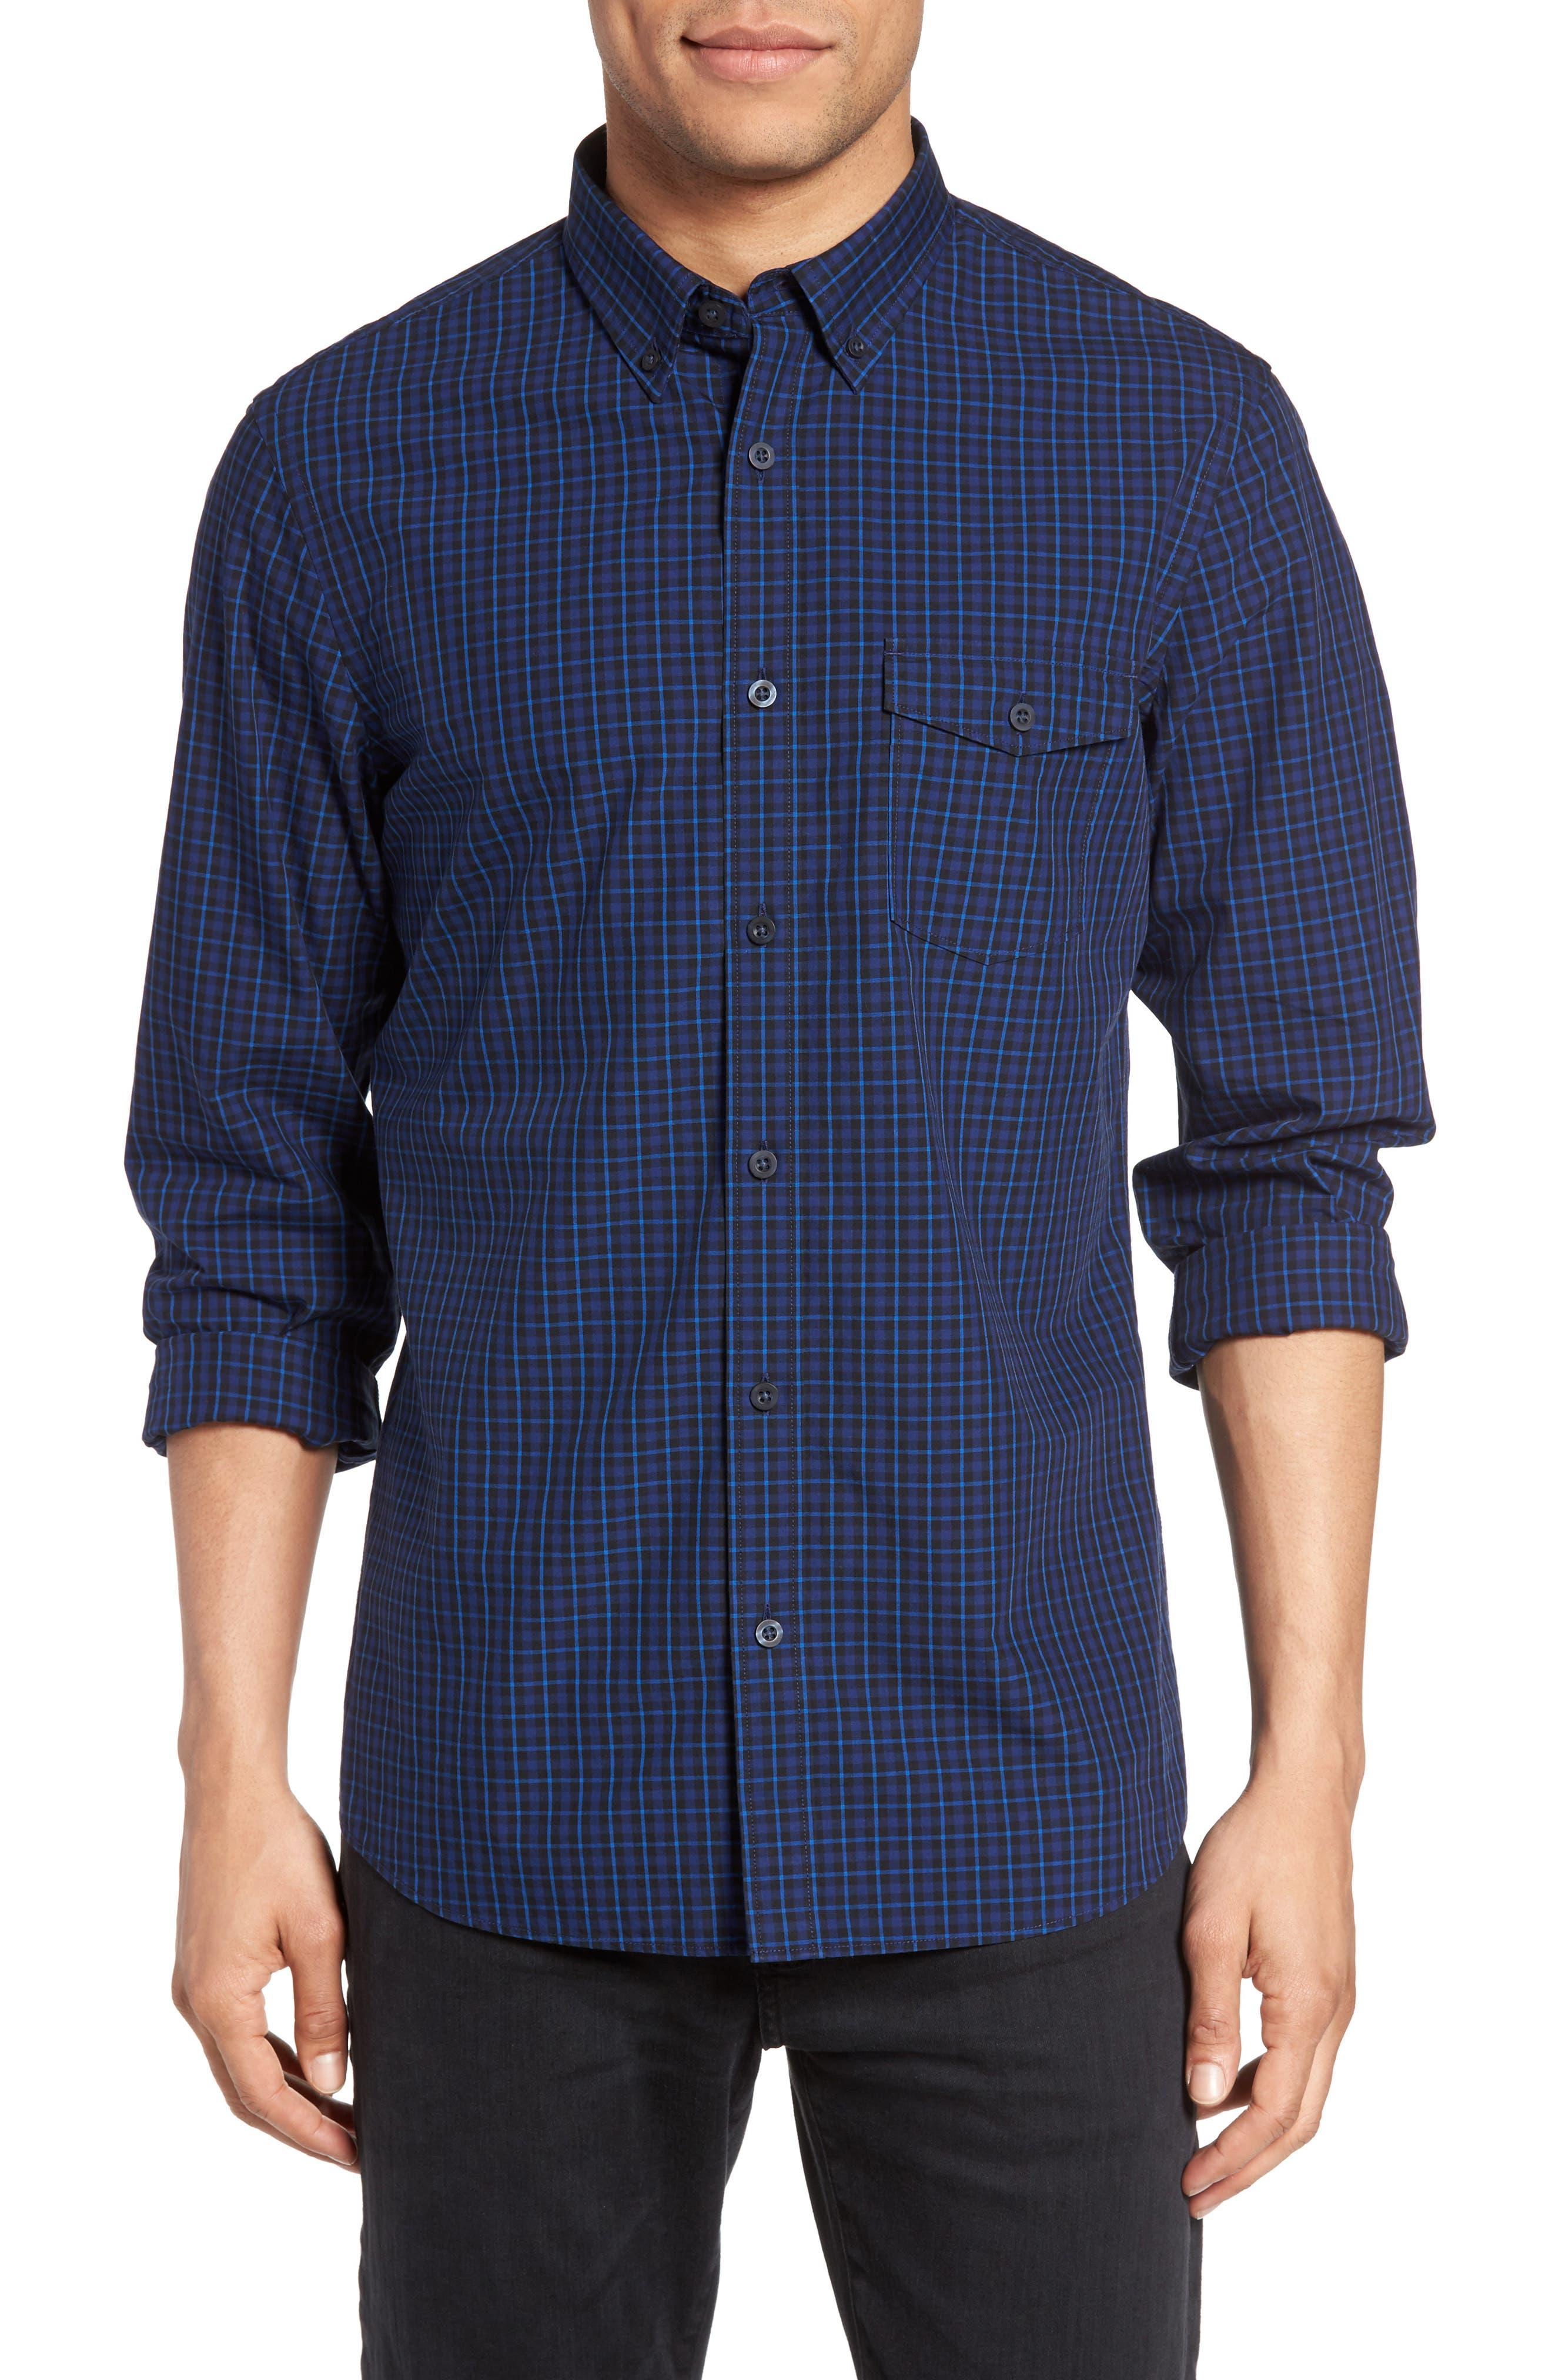 Nordstrom Men's Shop Slim Fit Plaid Sport Shirt (Regular & Tall)